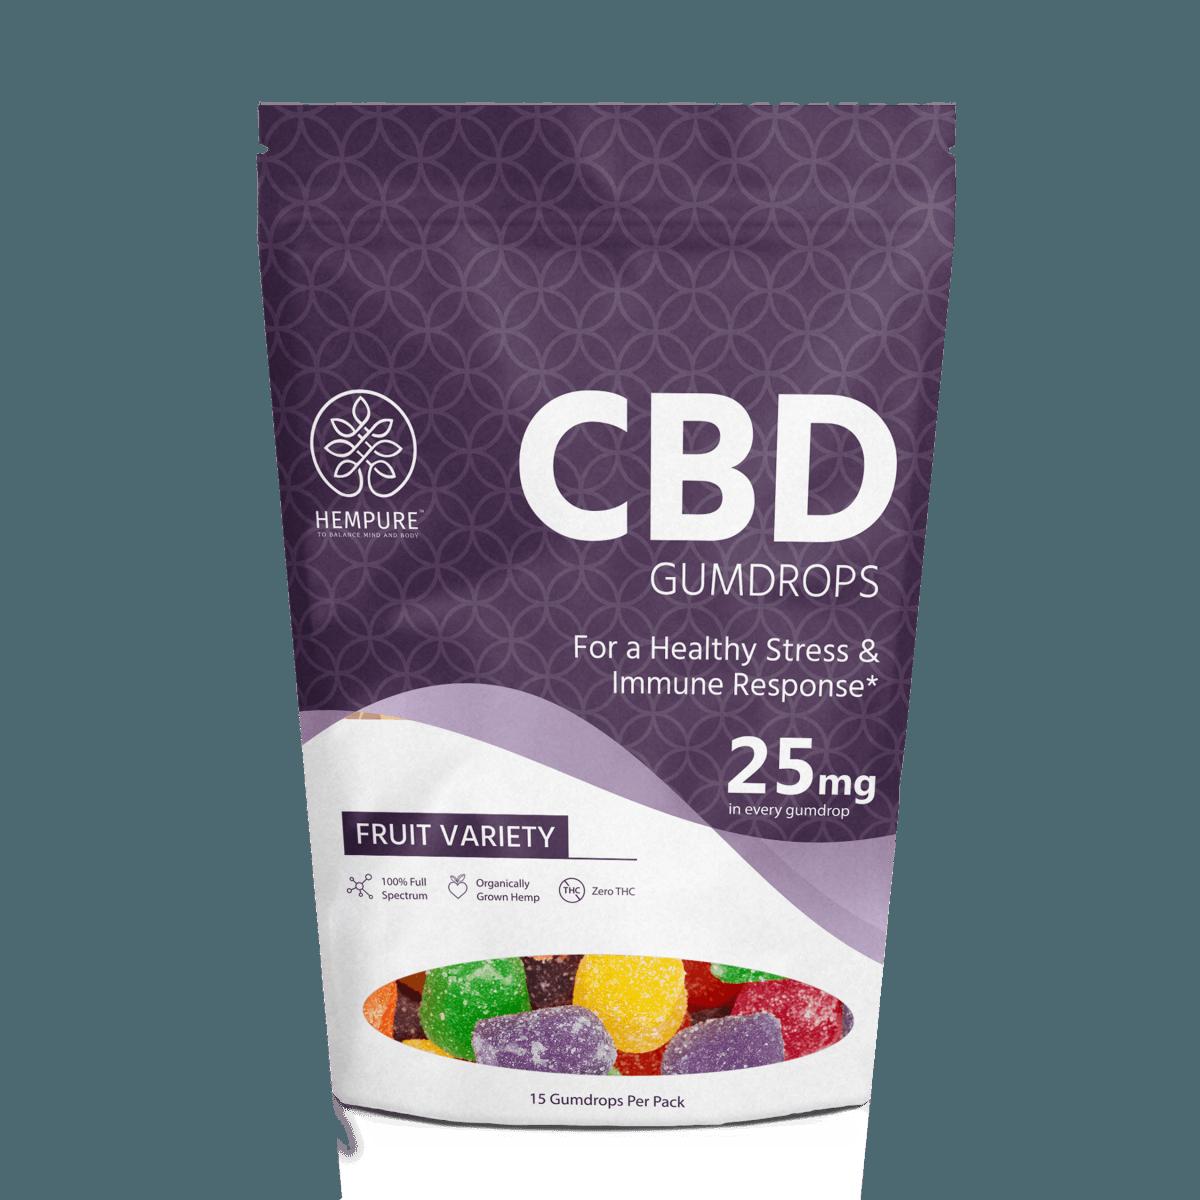 Hempure CBD Gumdrops coupon